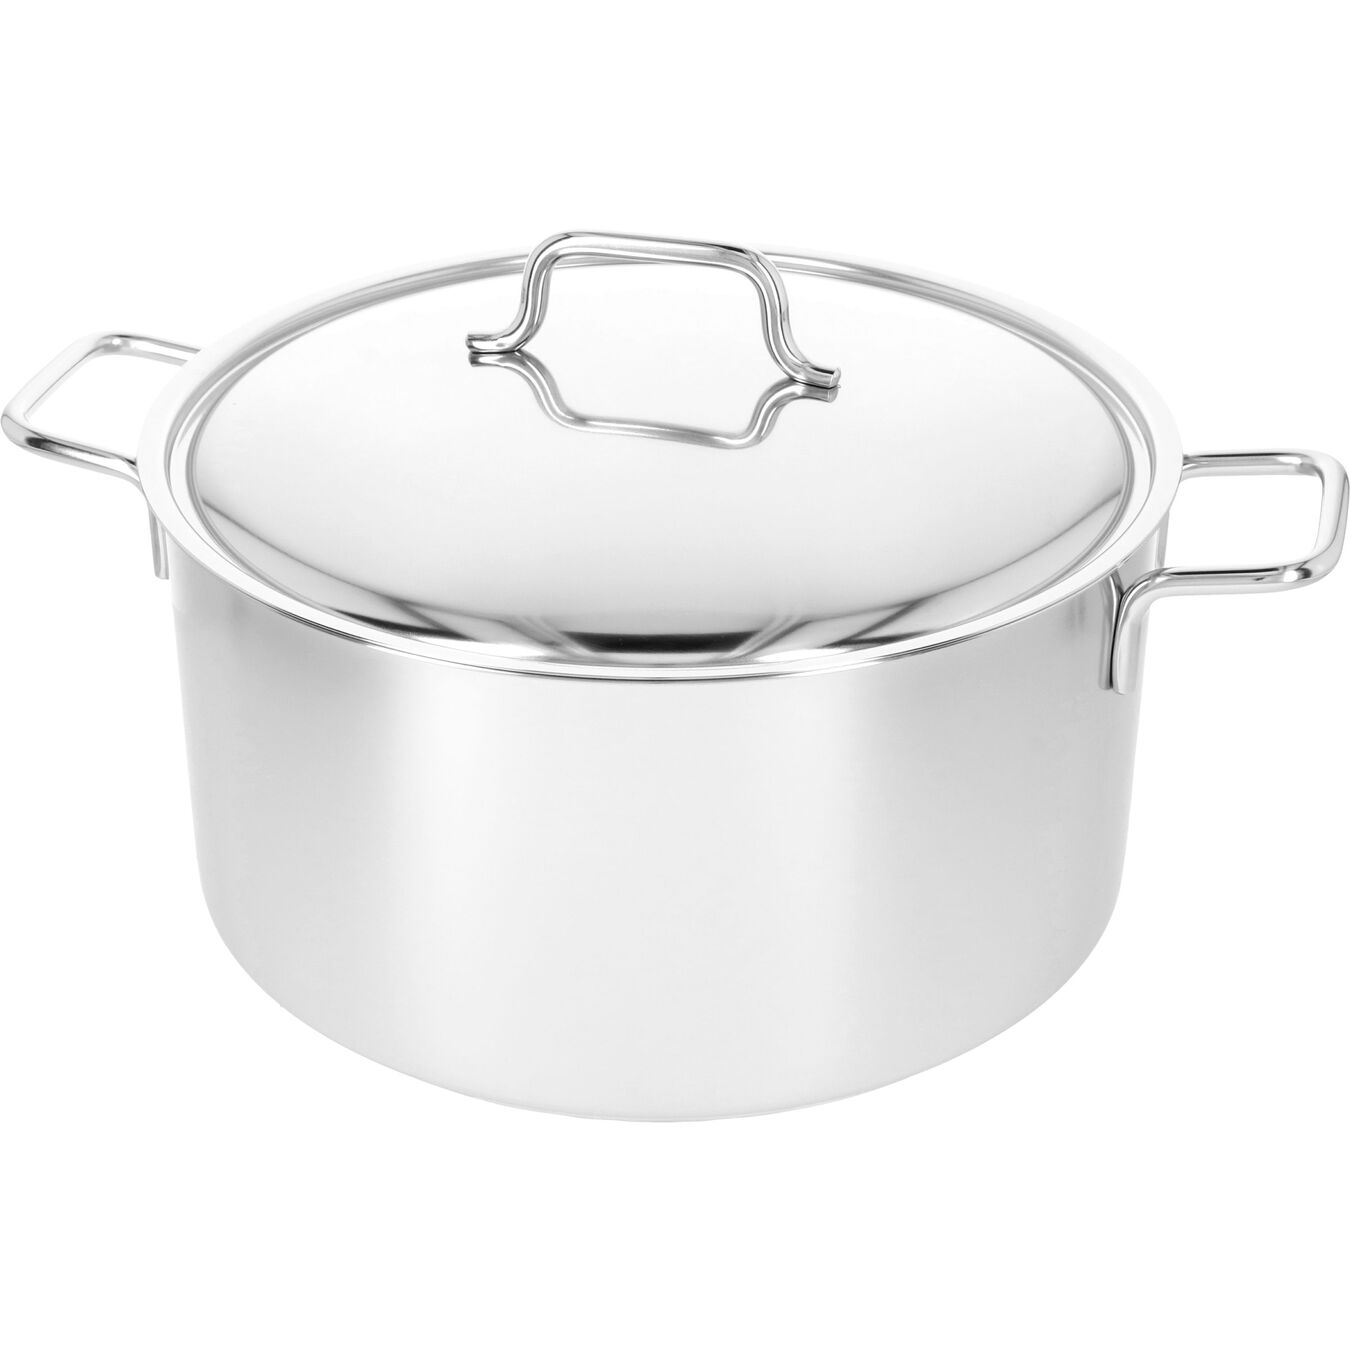 Kookpot met deksel 28 cm / 8,4 l,,large 2